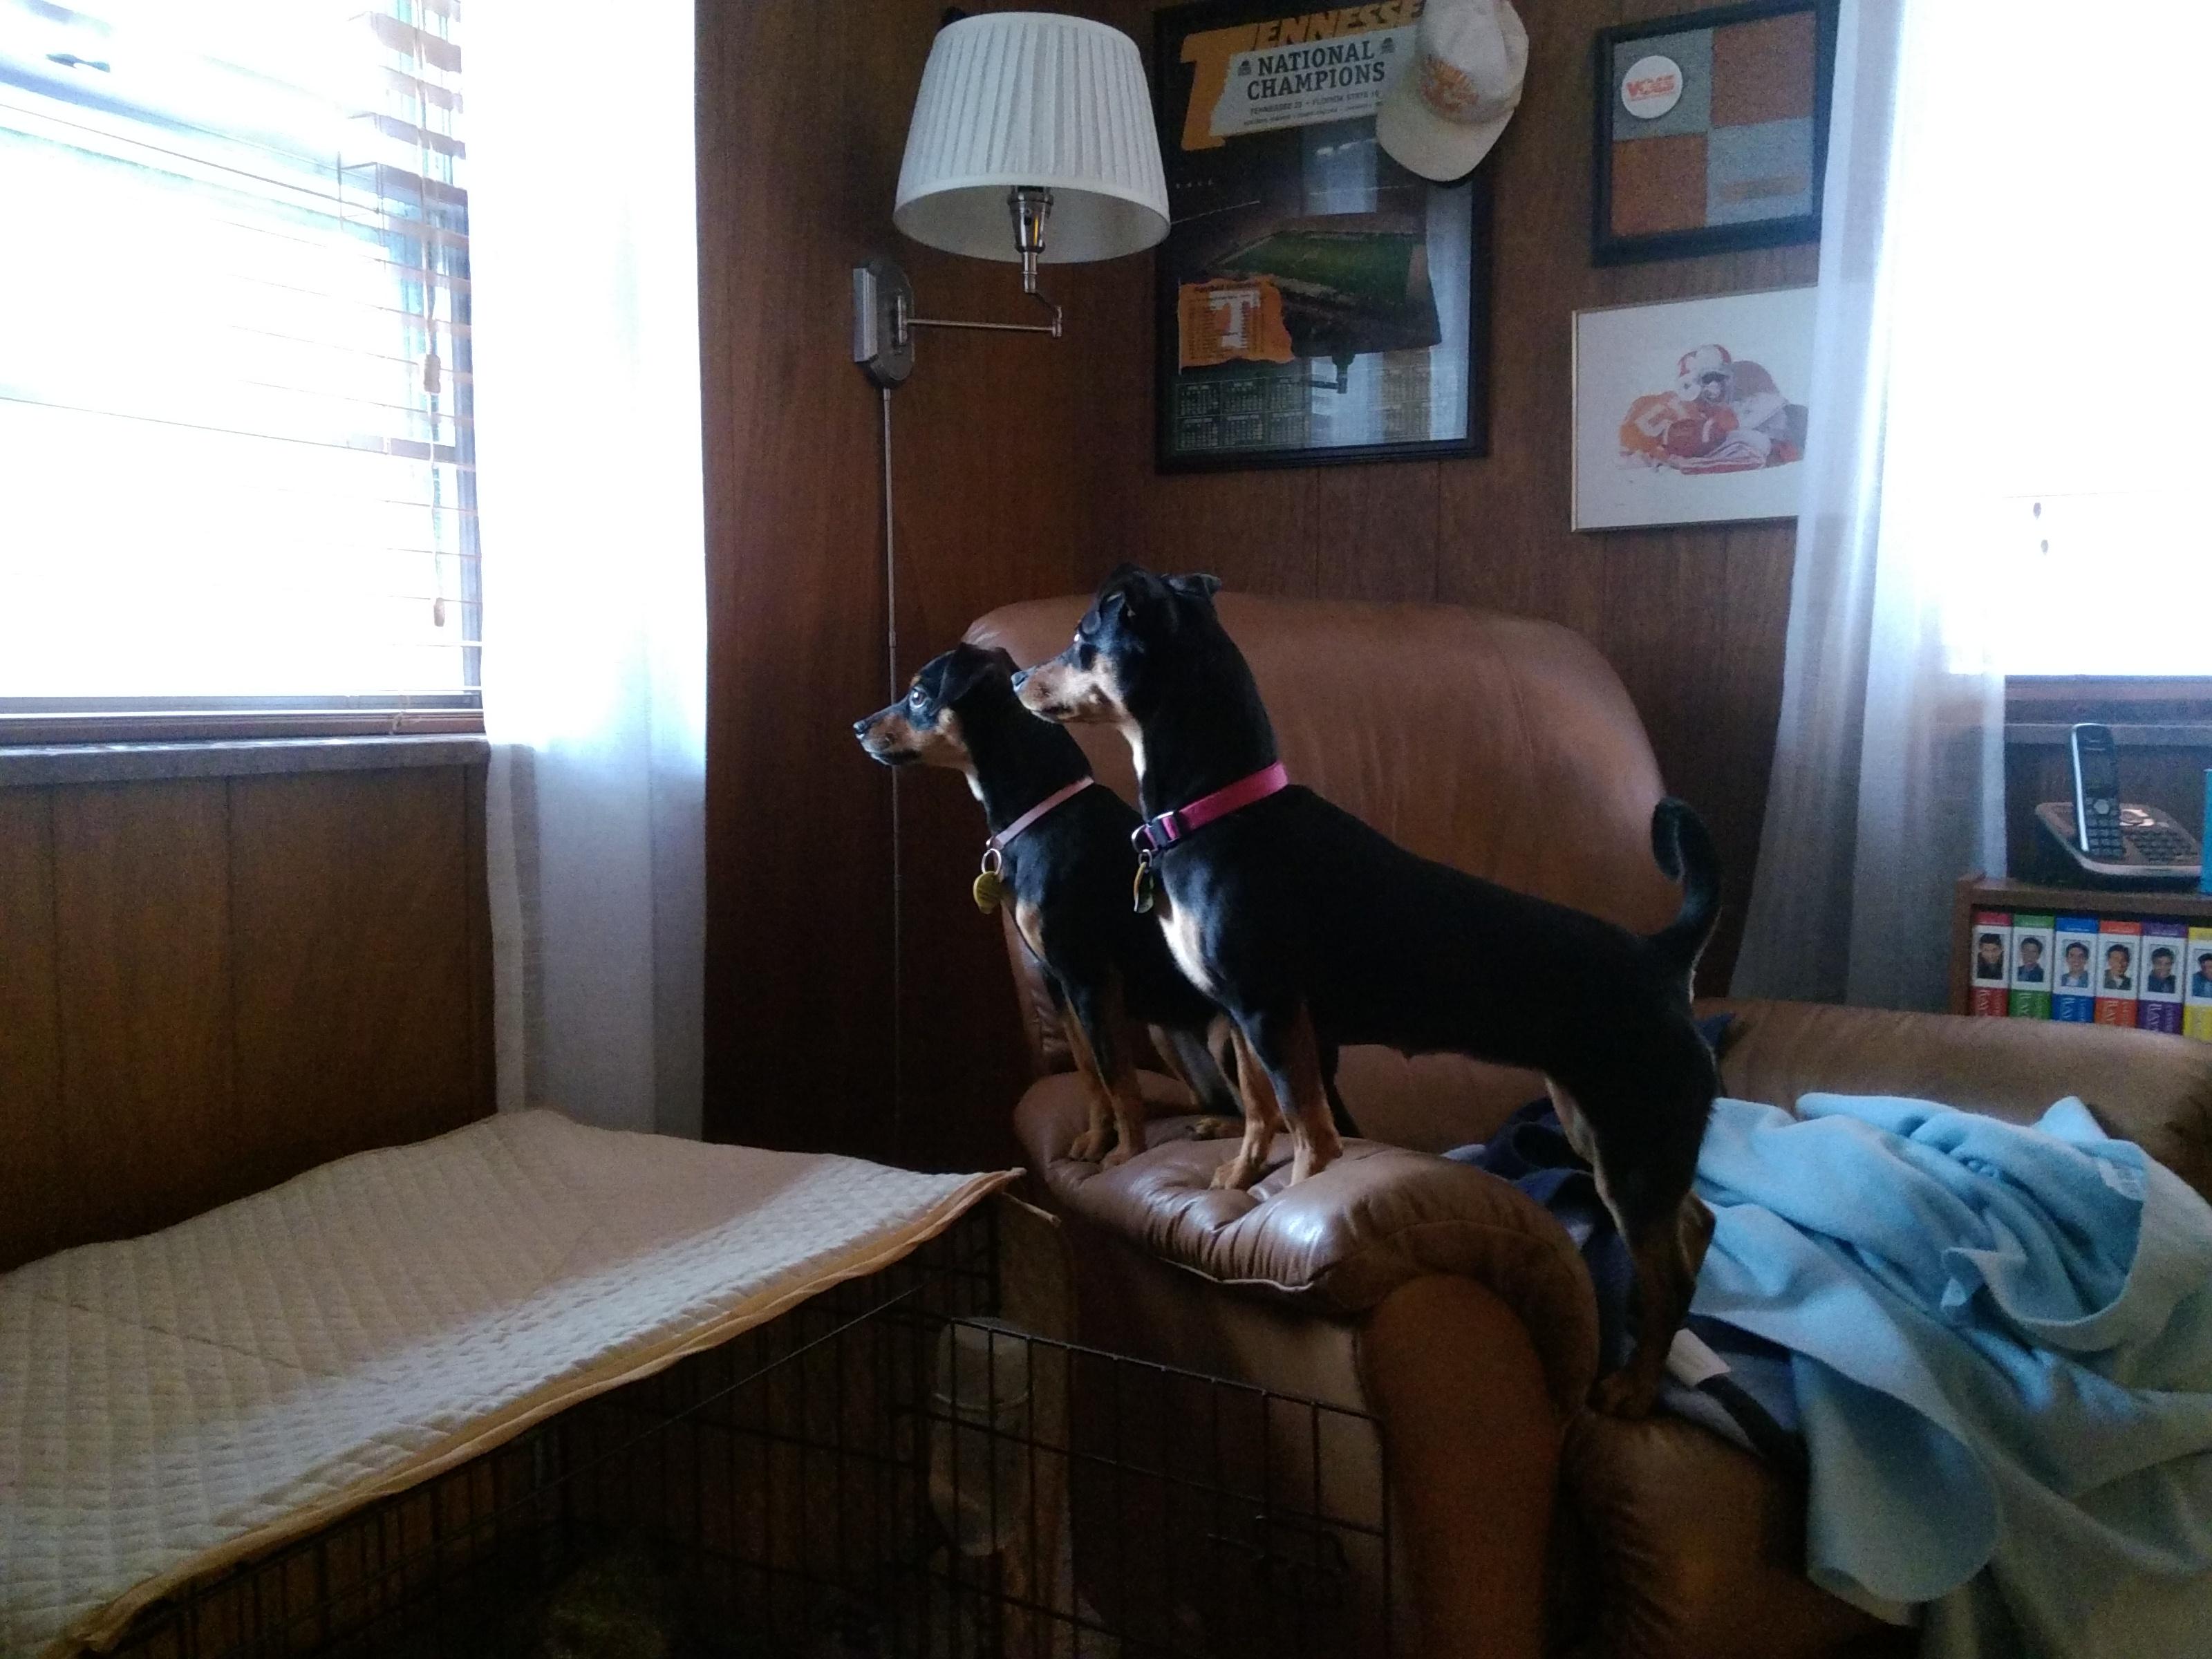 On guard through the window